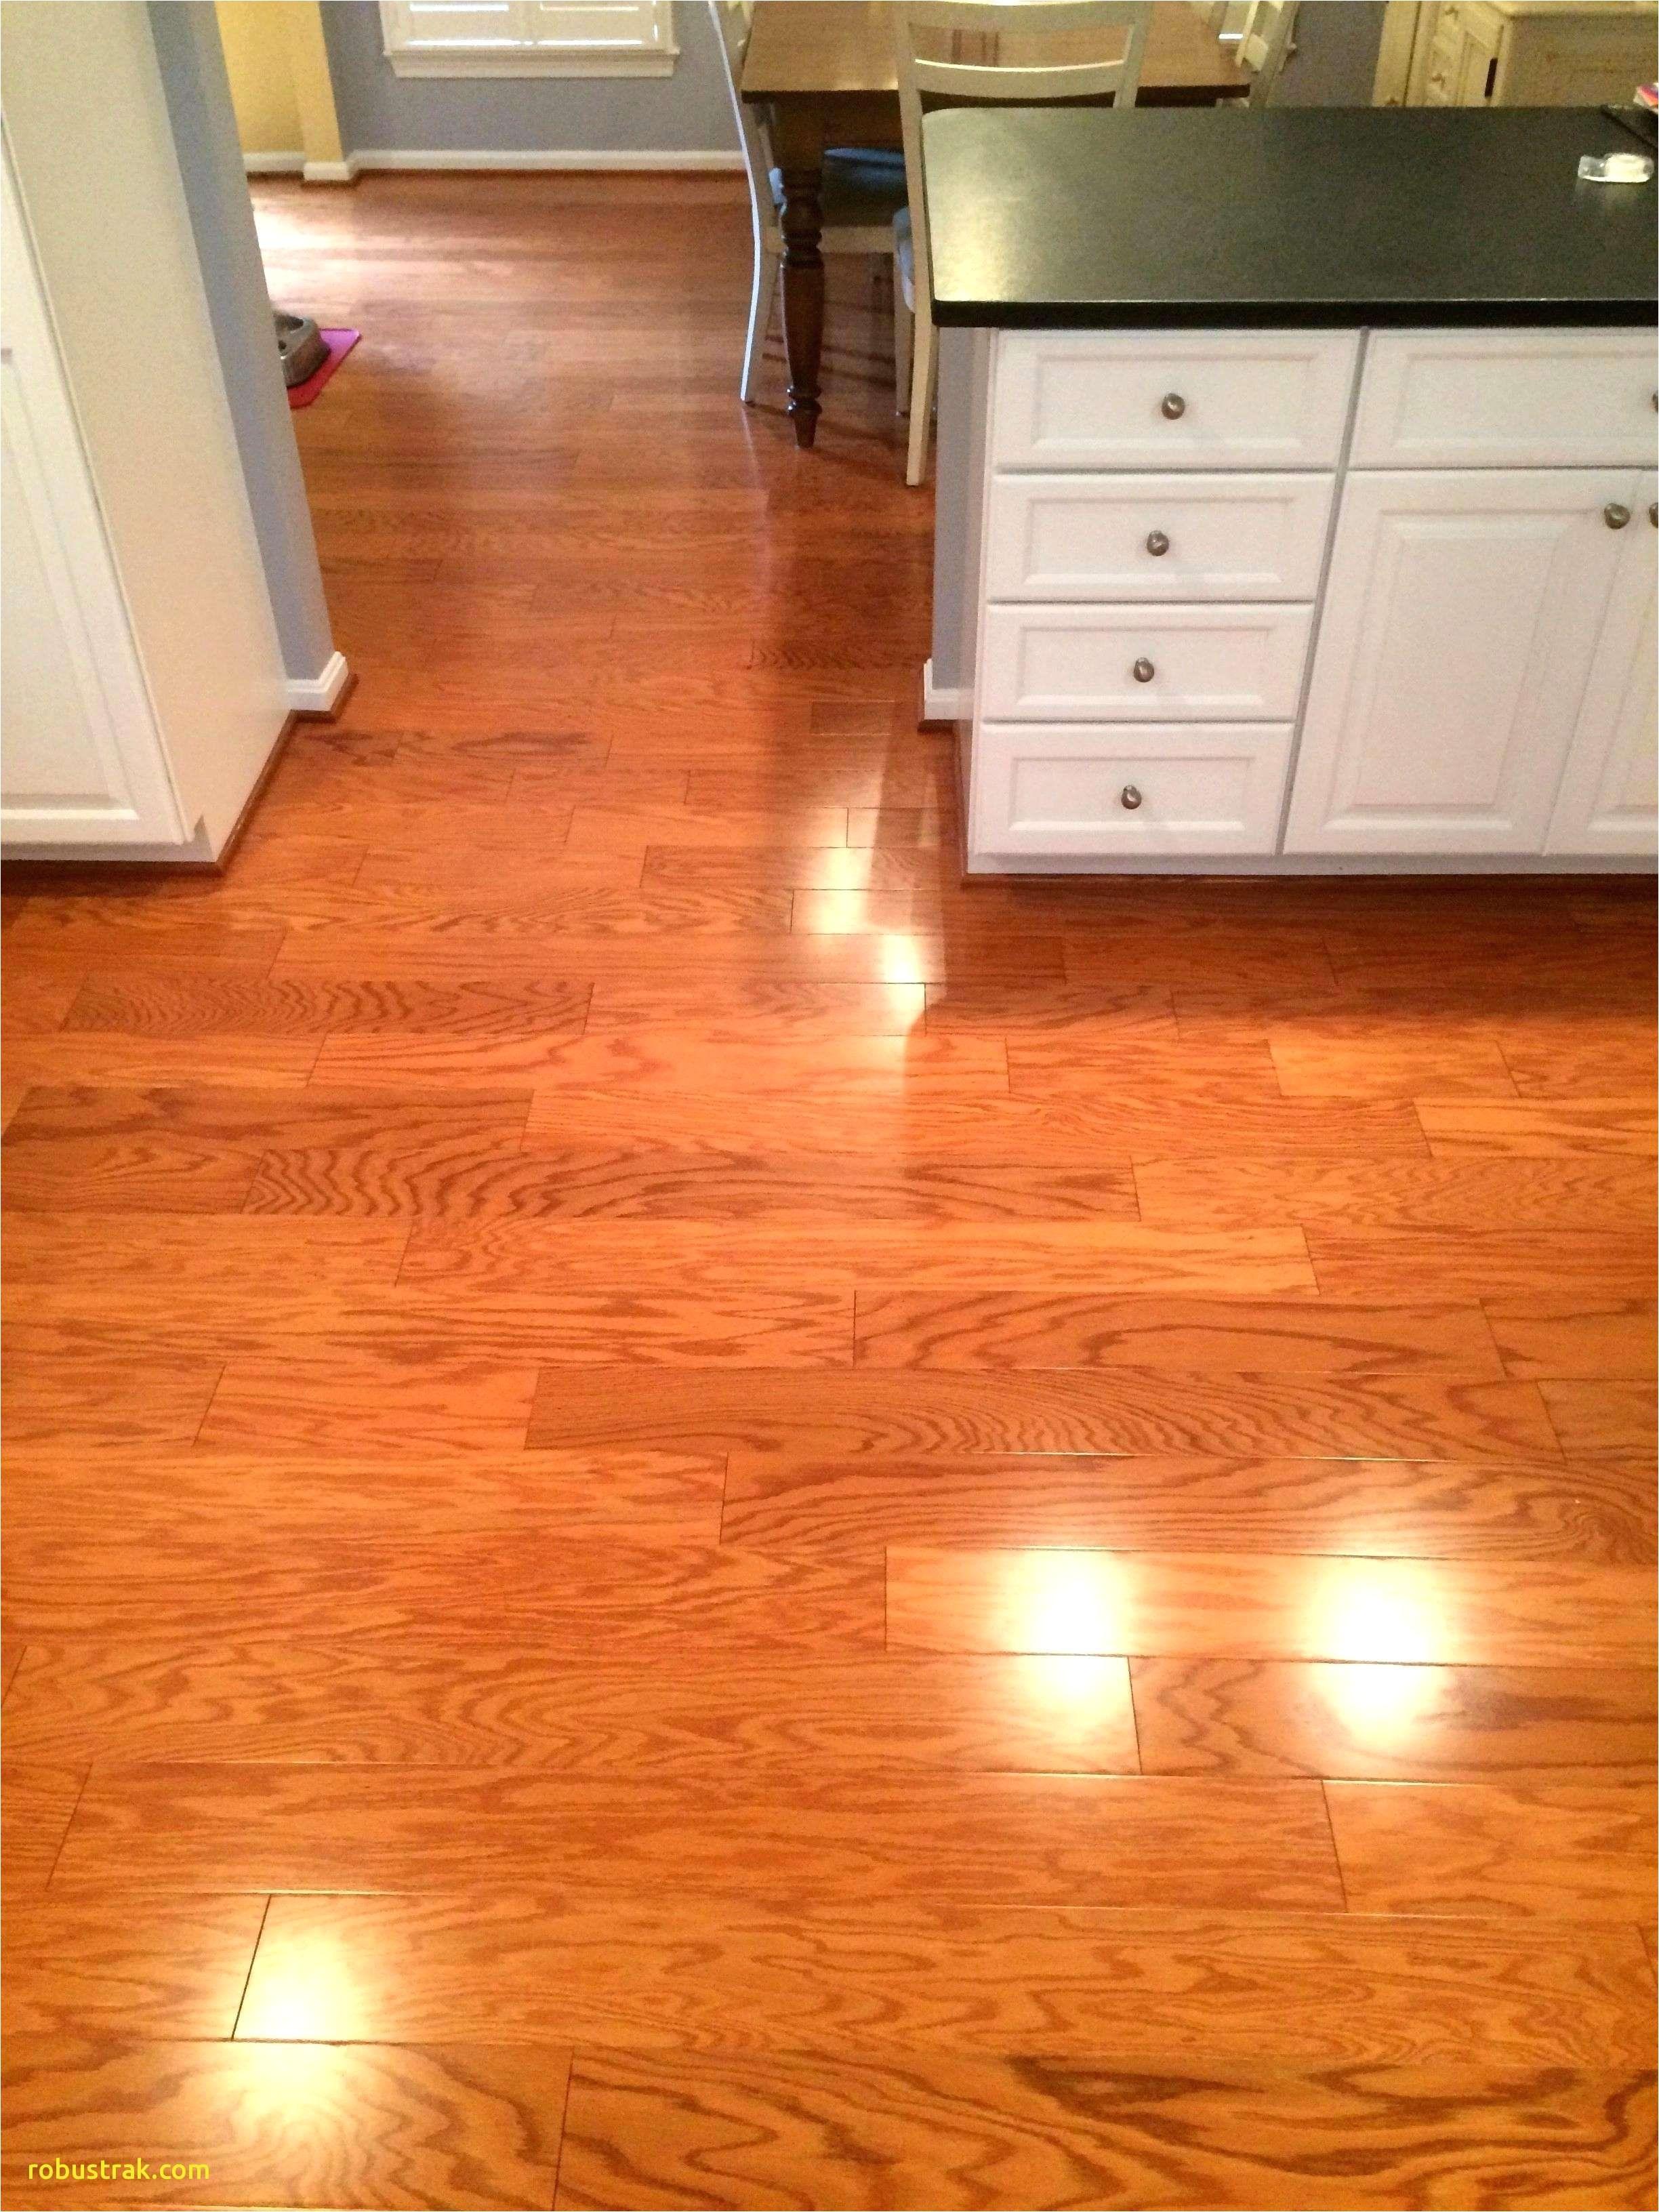 Wodden Floor 40 Best Place to Buy Wood Flooring Ideas